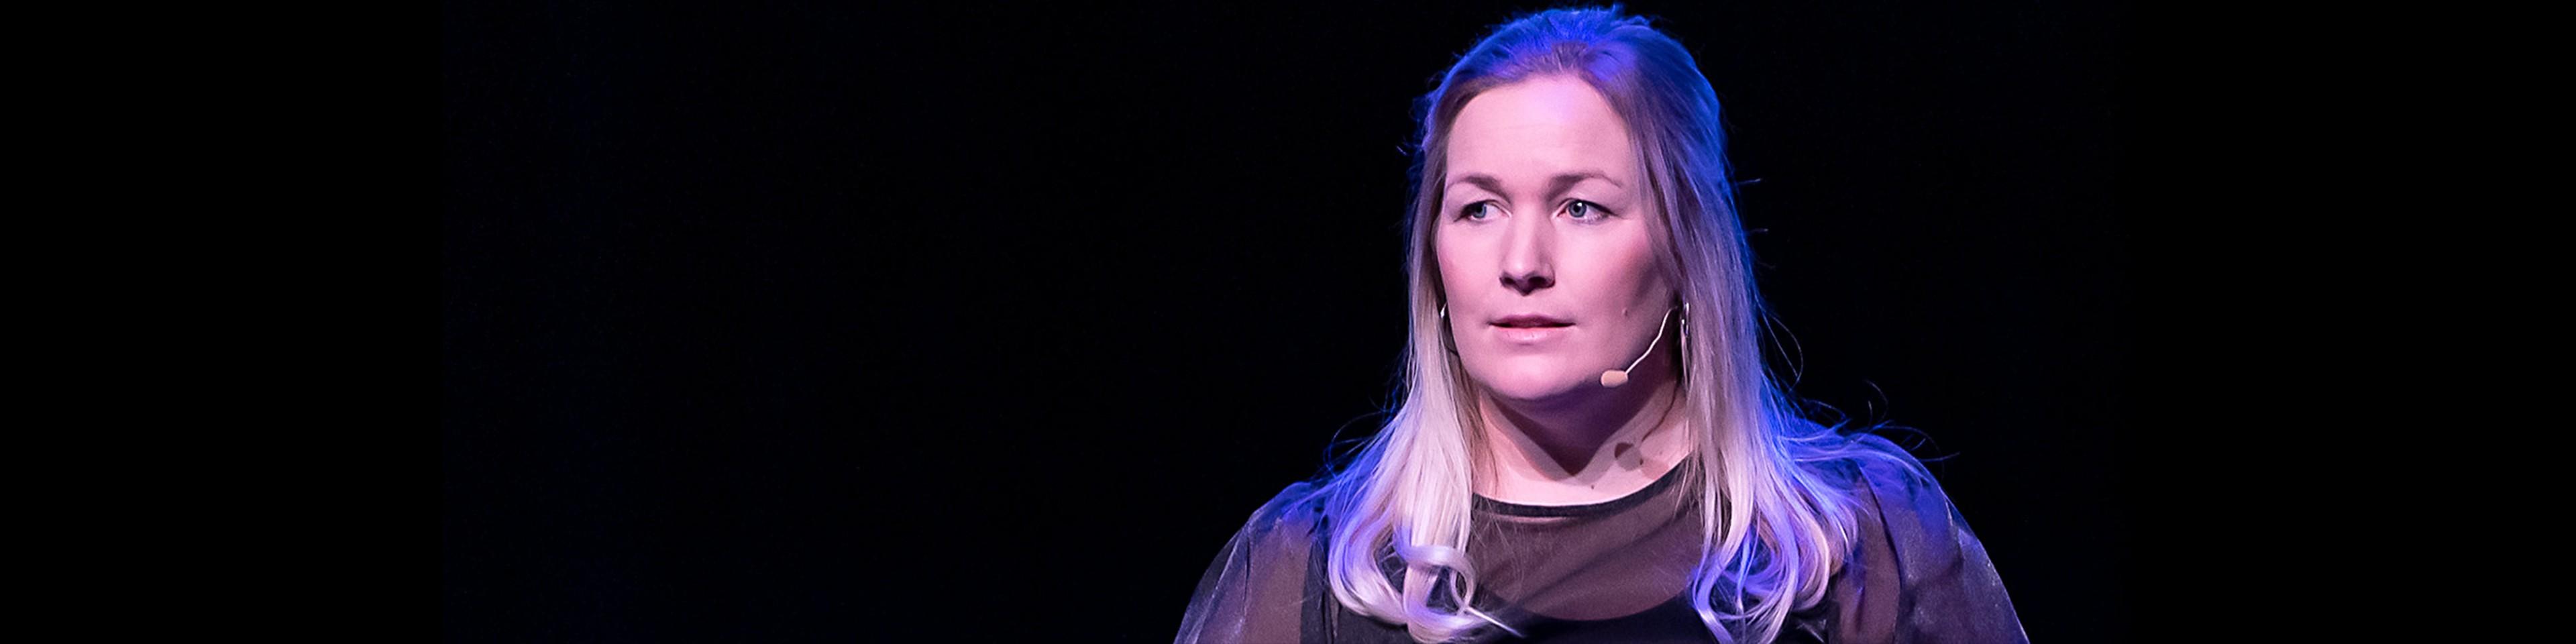 Linda Asplund Norengs Redovisning Gävle